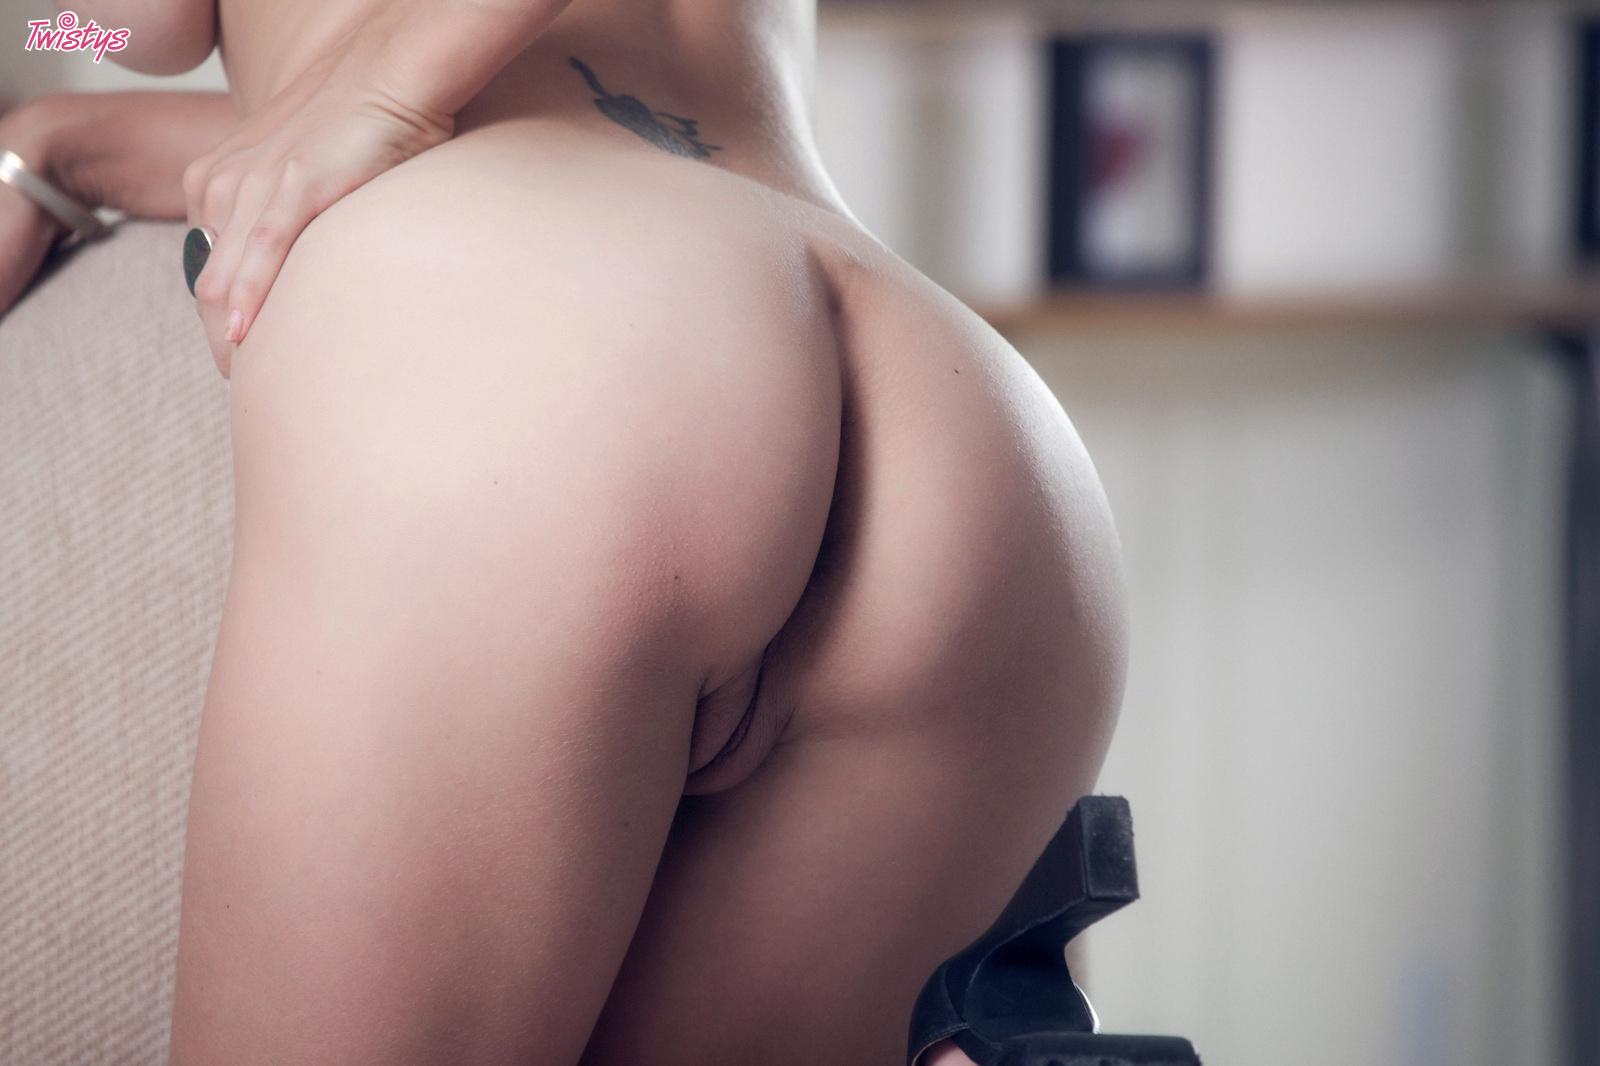 shay-laren-corset-blonde-tits-nude-twistys-18